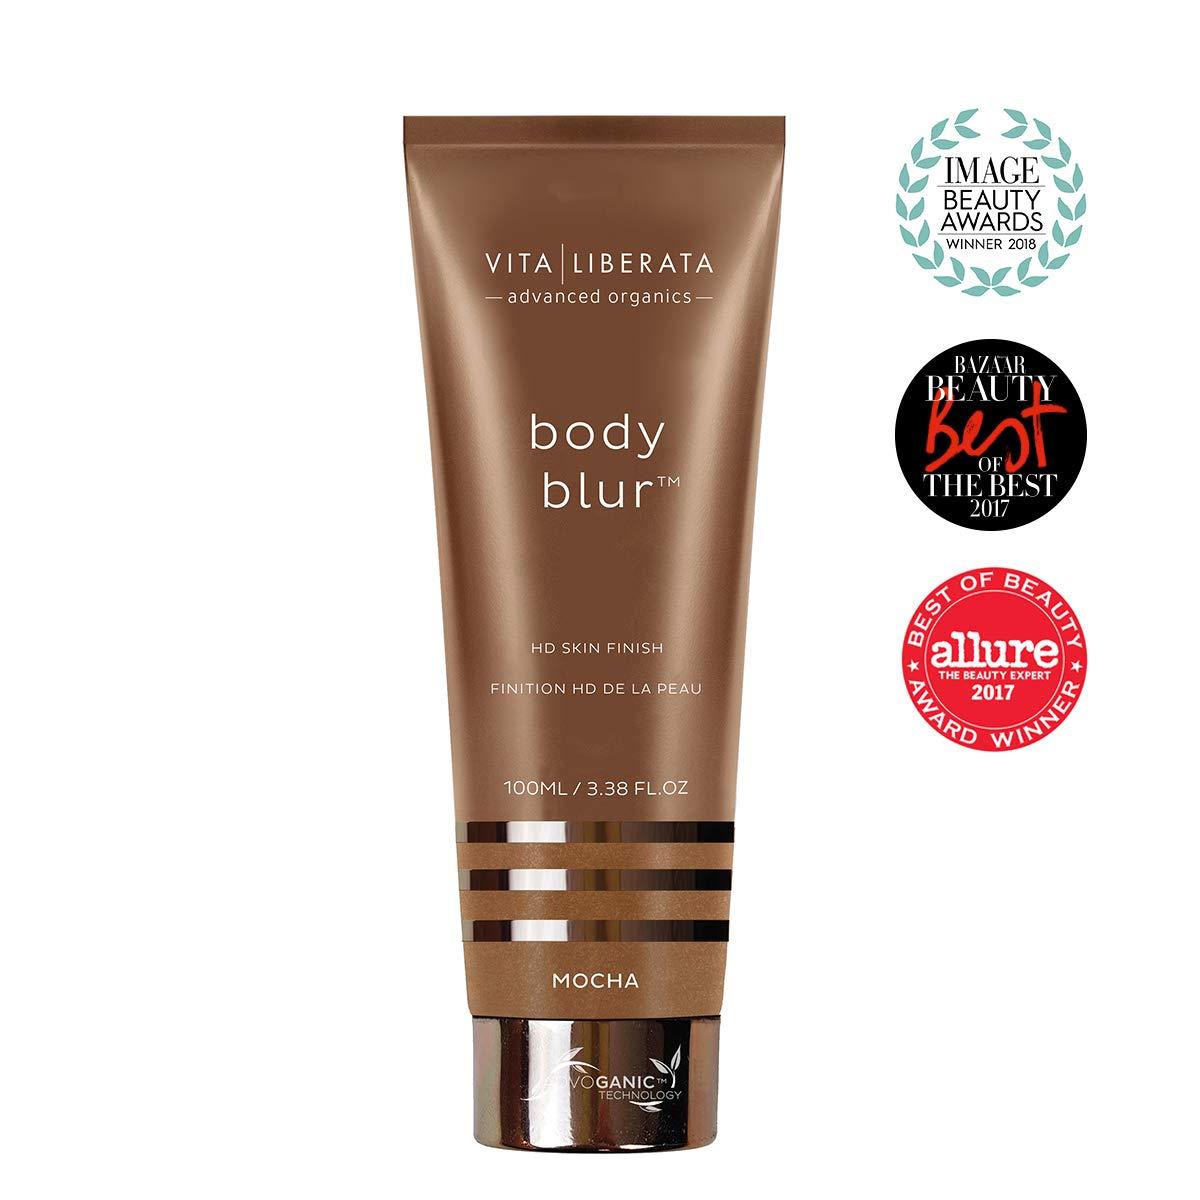 Vita Liberata Body Blur Instant HD Skin Finish Mocha Dark Bronzer, 3.38 Fl Oz